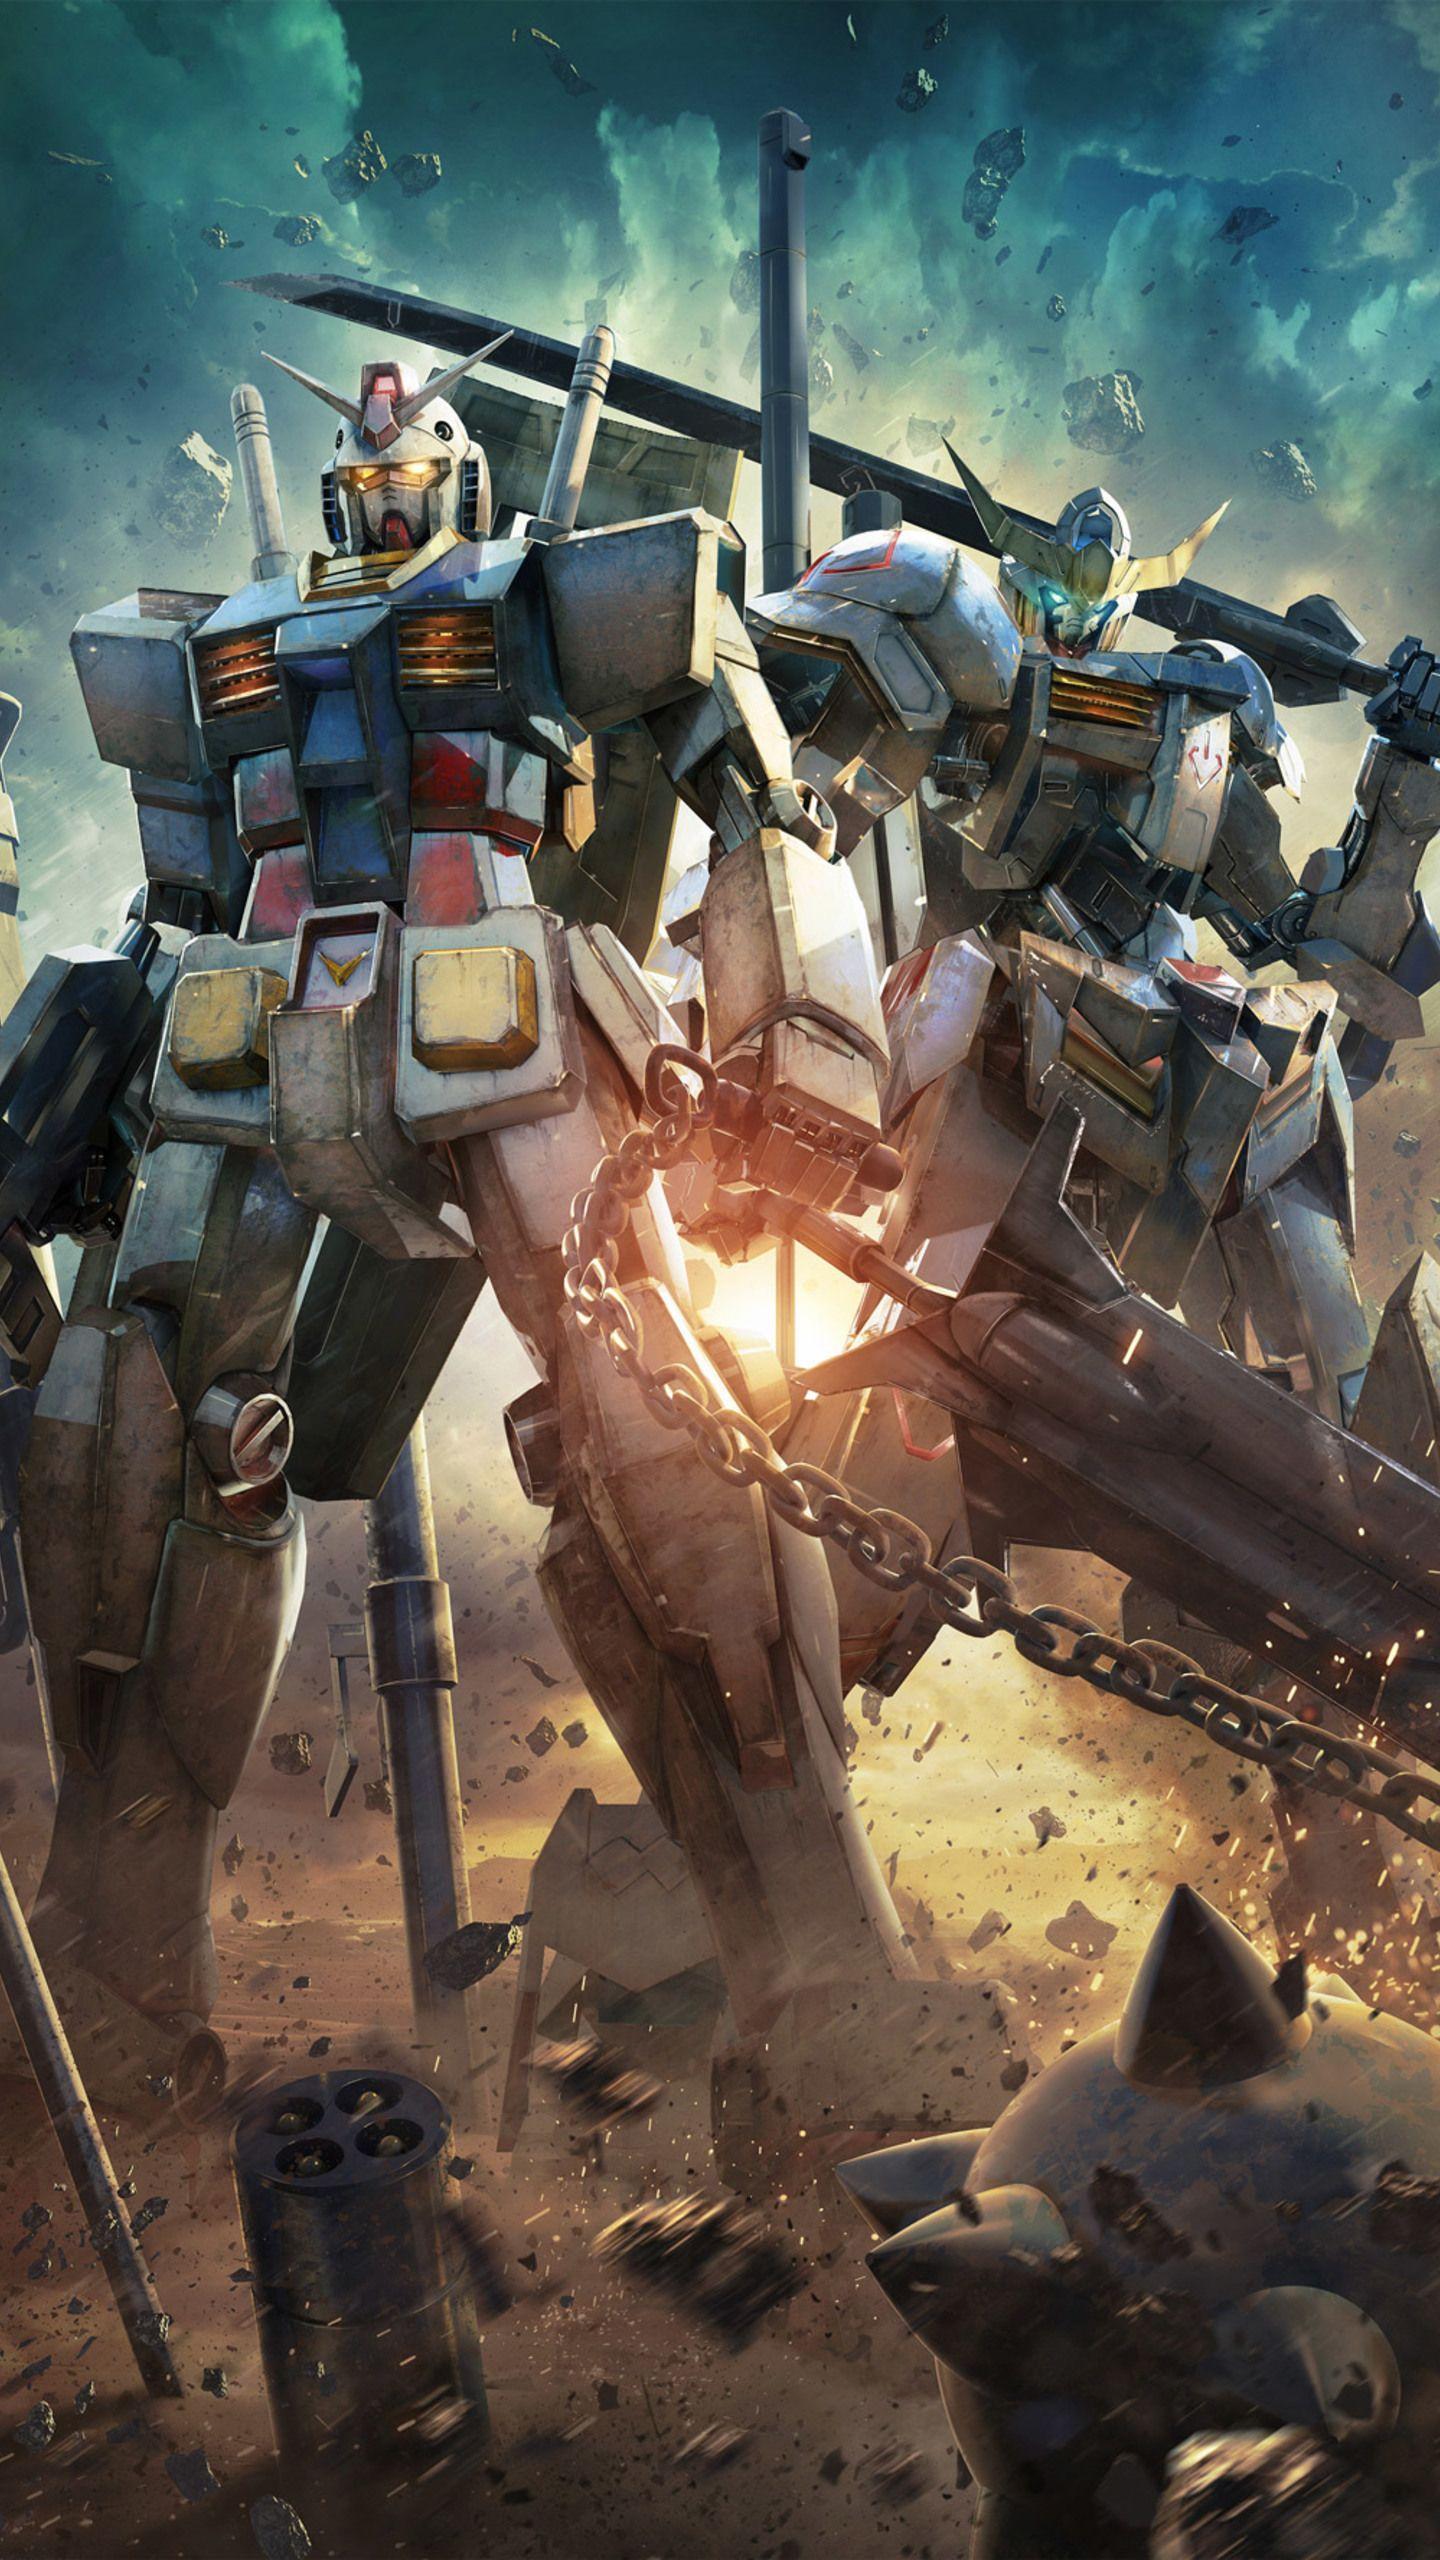 Gundam Wallpaper 1440x2560 Mywallpapers Site In 2020 Gundam Wallpapers Gundam Art Gundam Iron Blooded Orphans